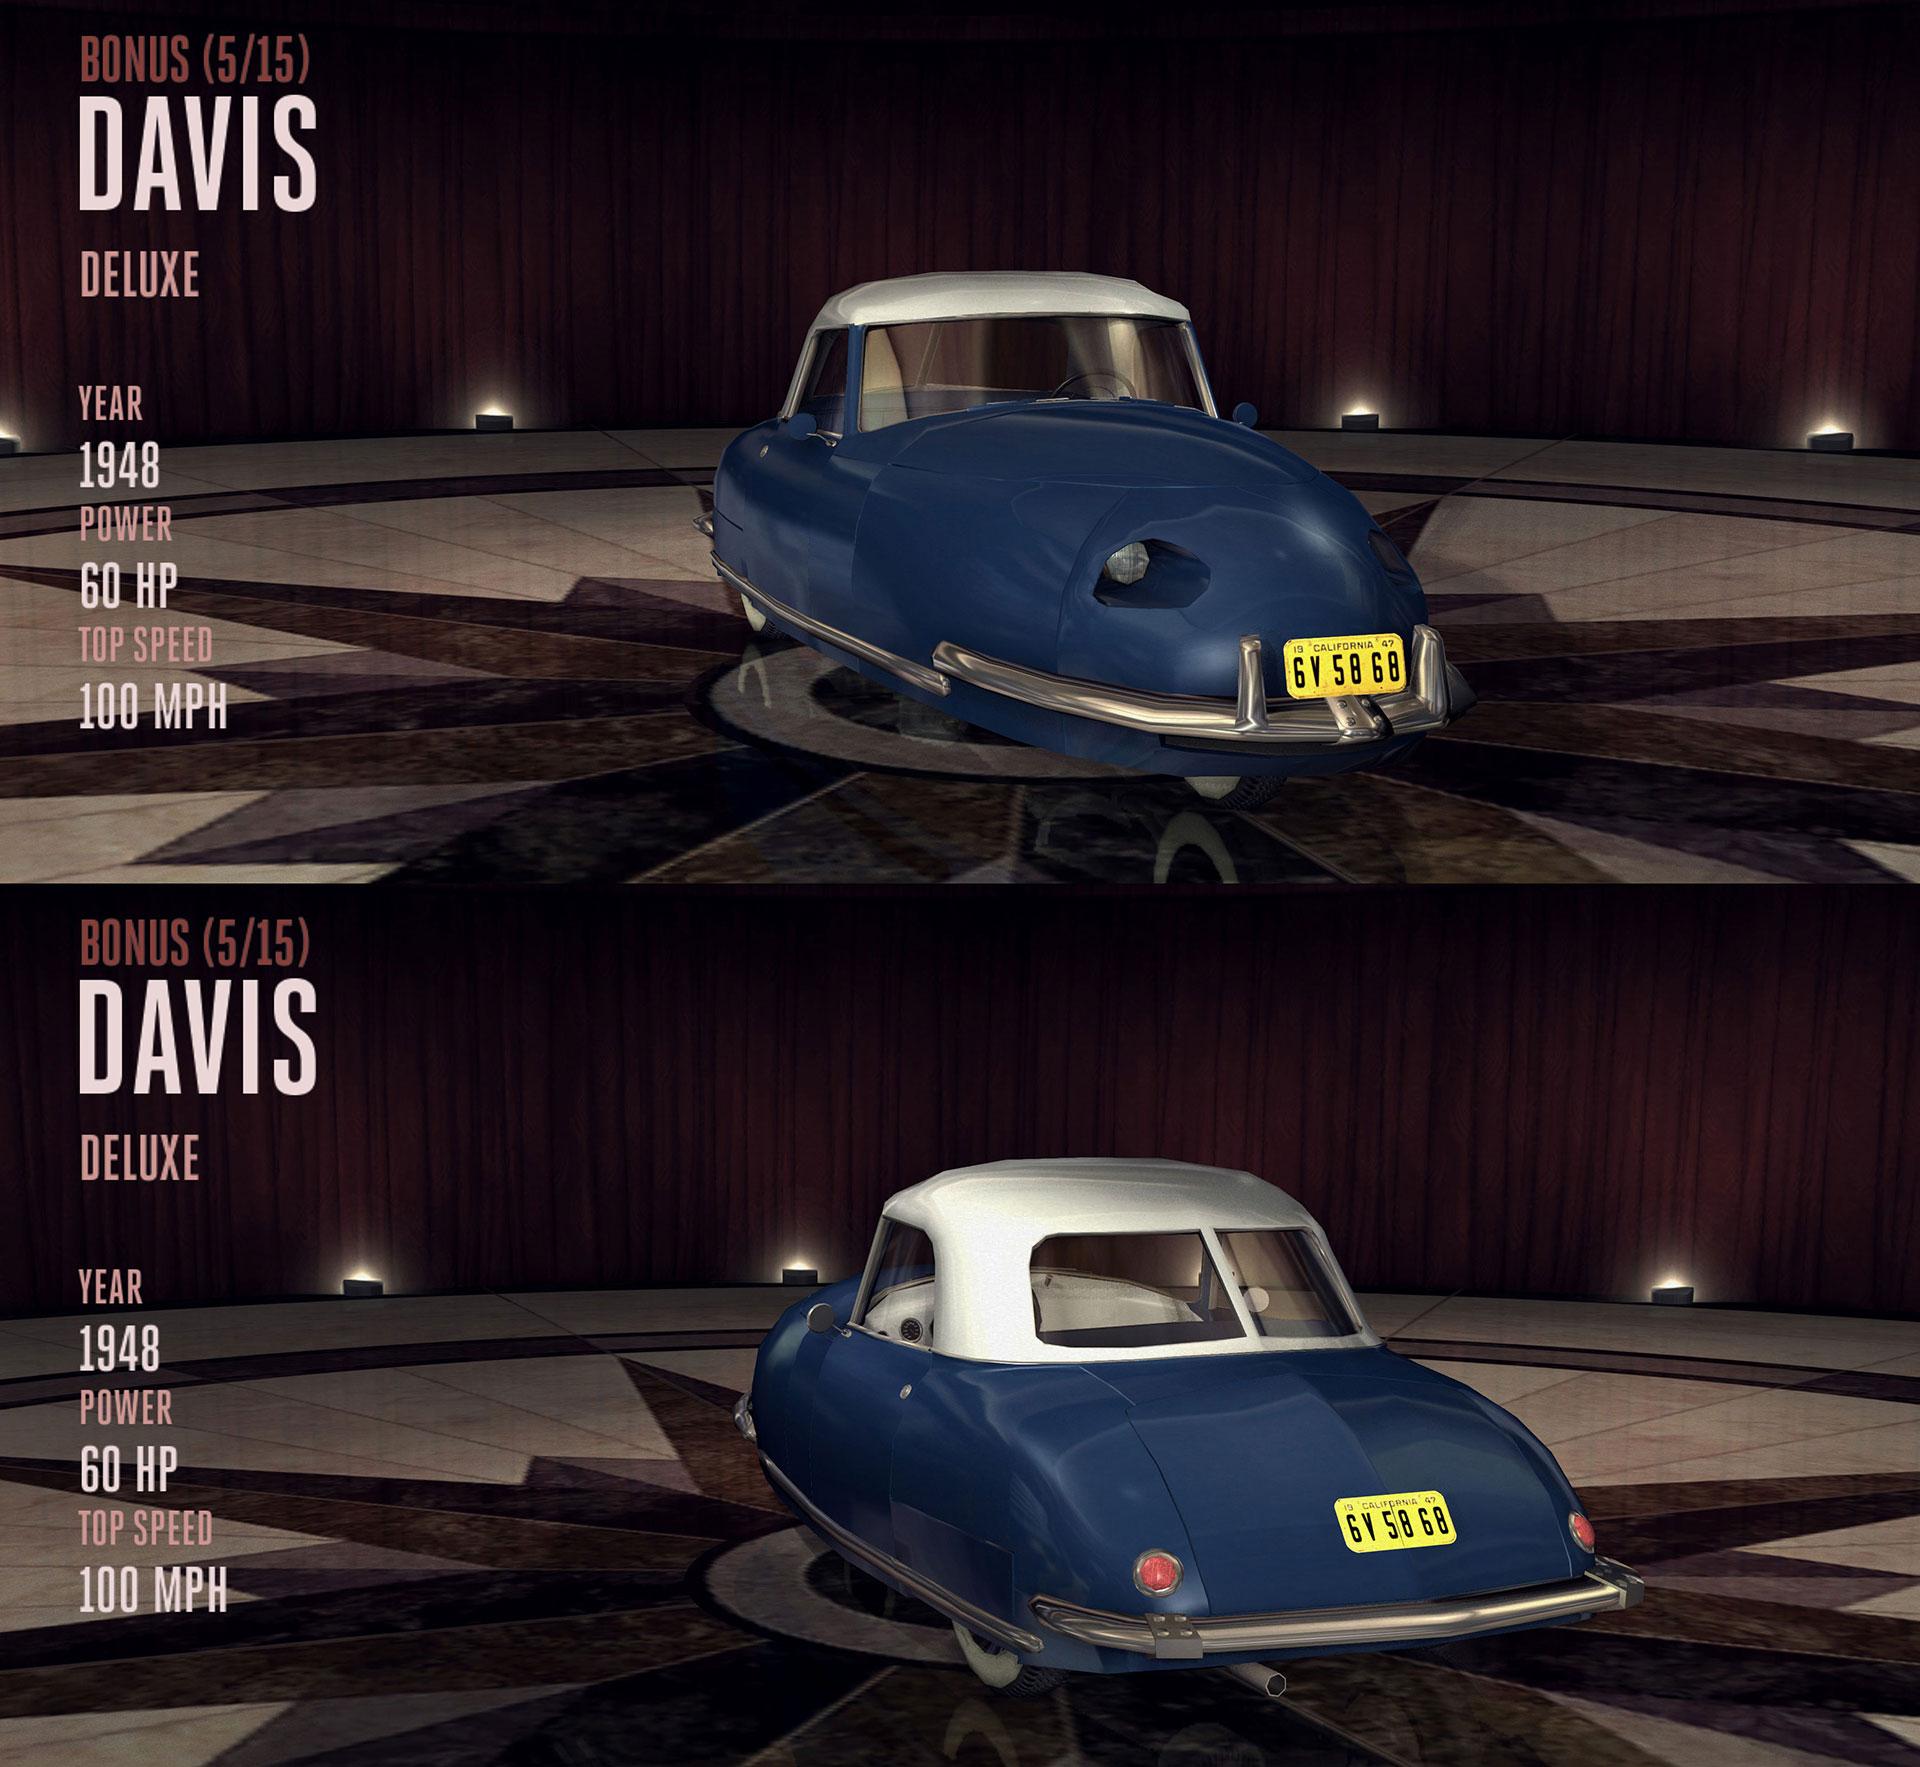 File:1948-davis-deluxe.jpg